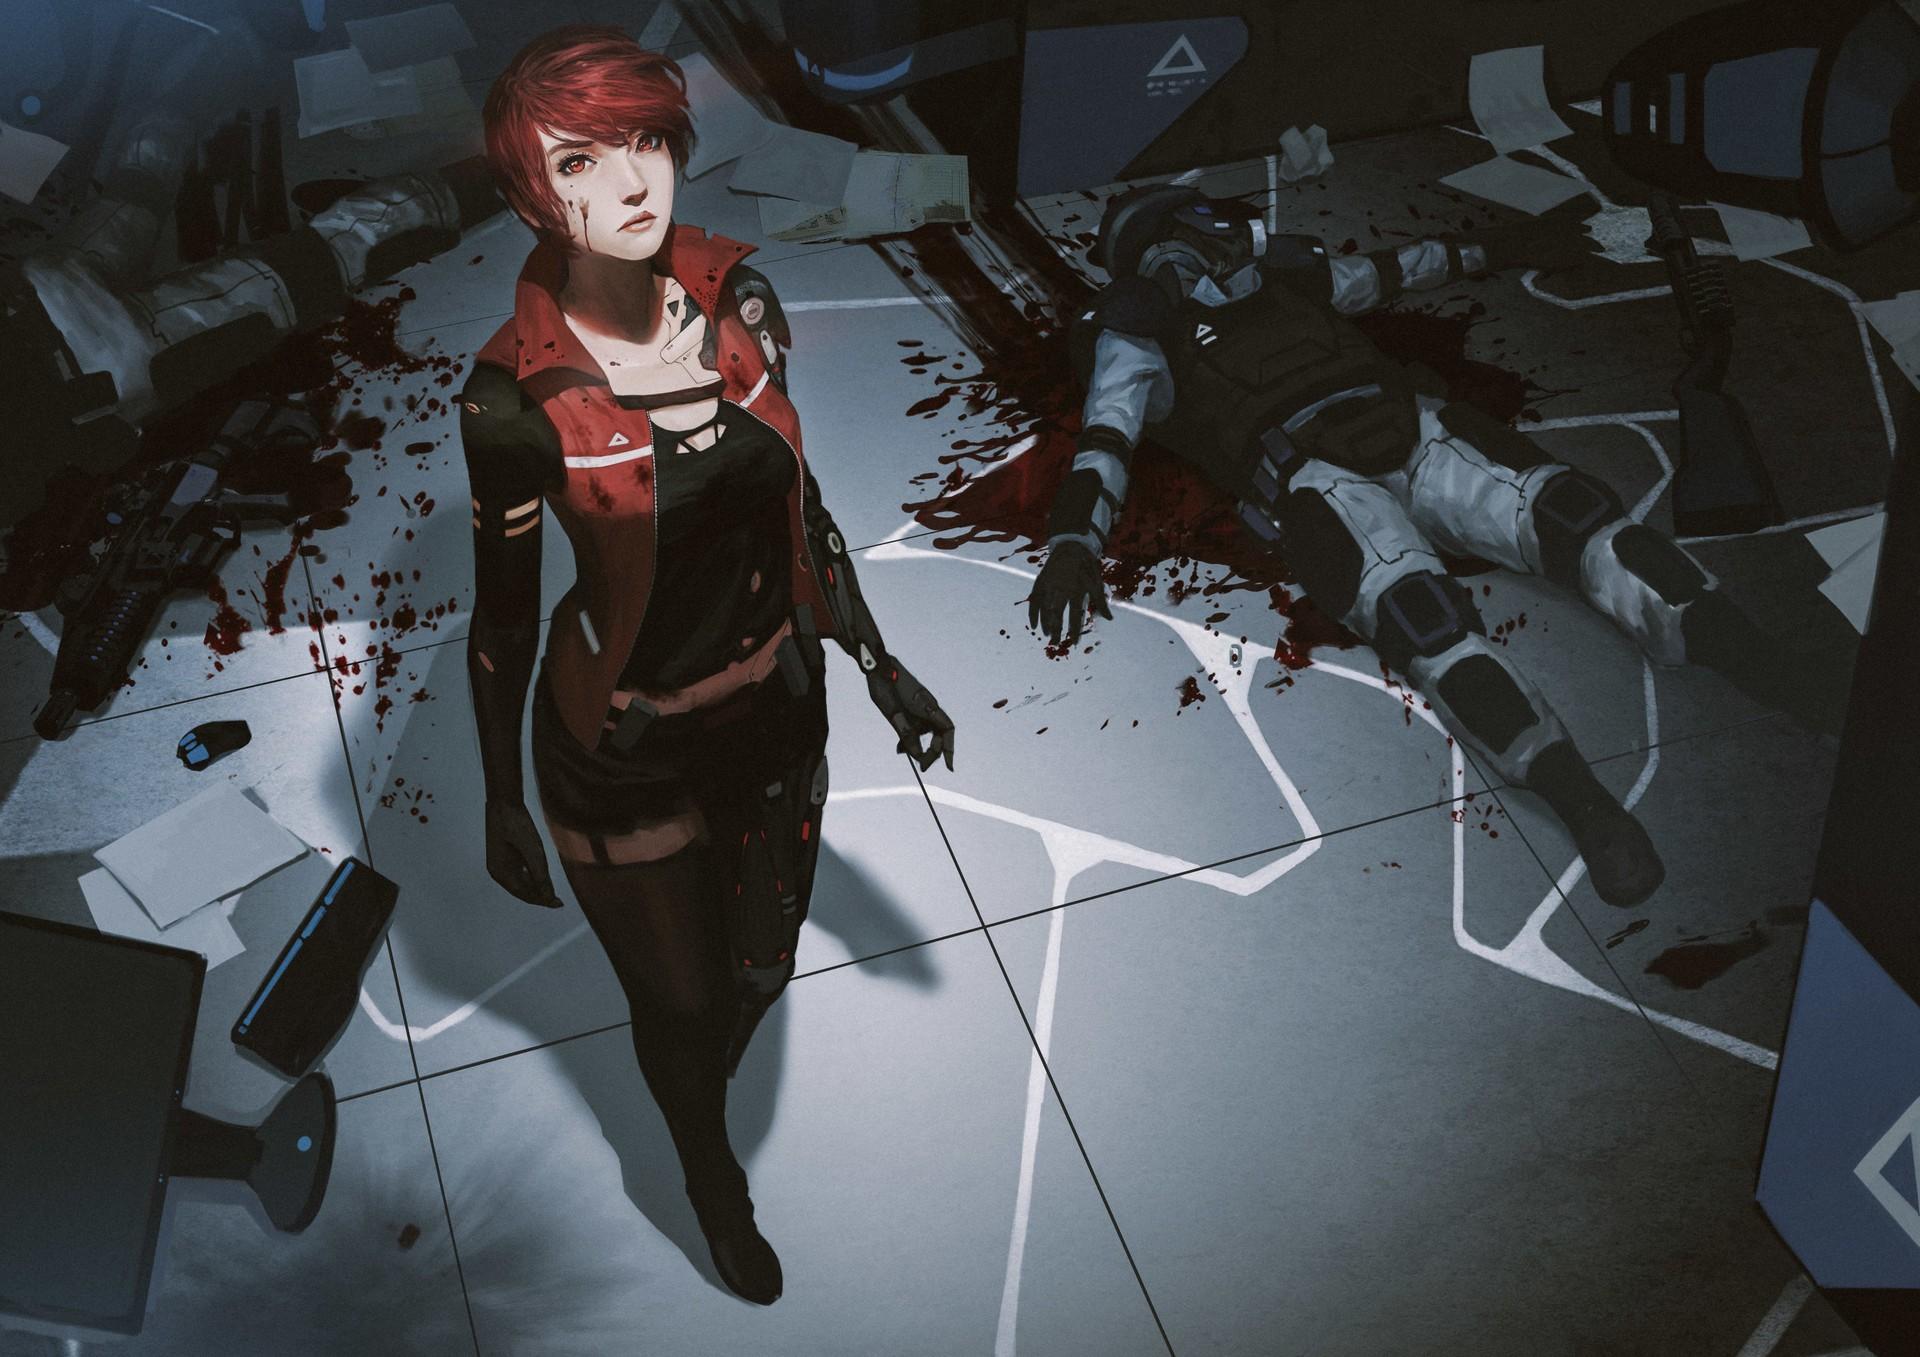 General 1920x1357 futuristic anime girls blood redhead short hair